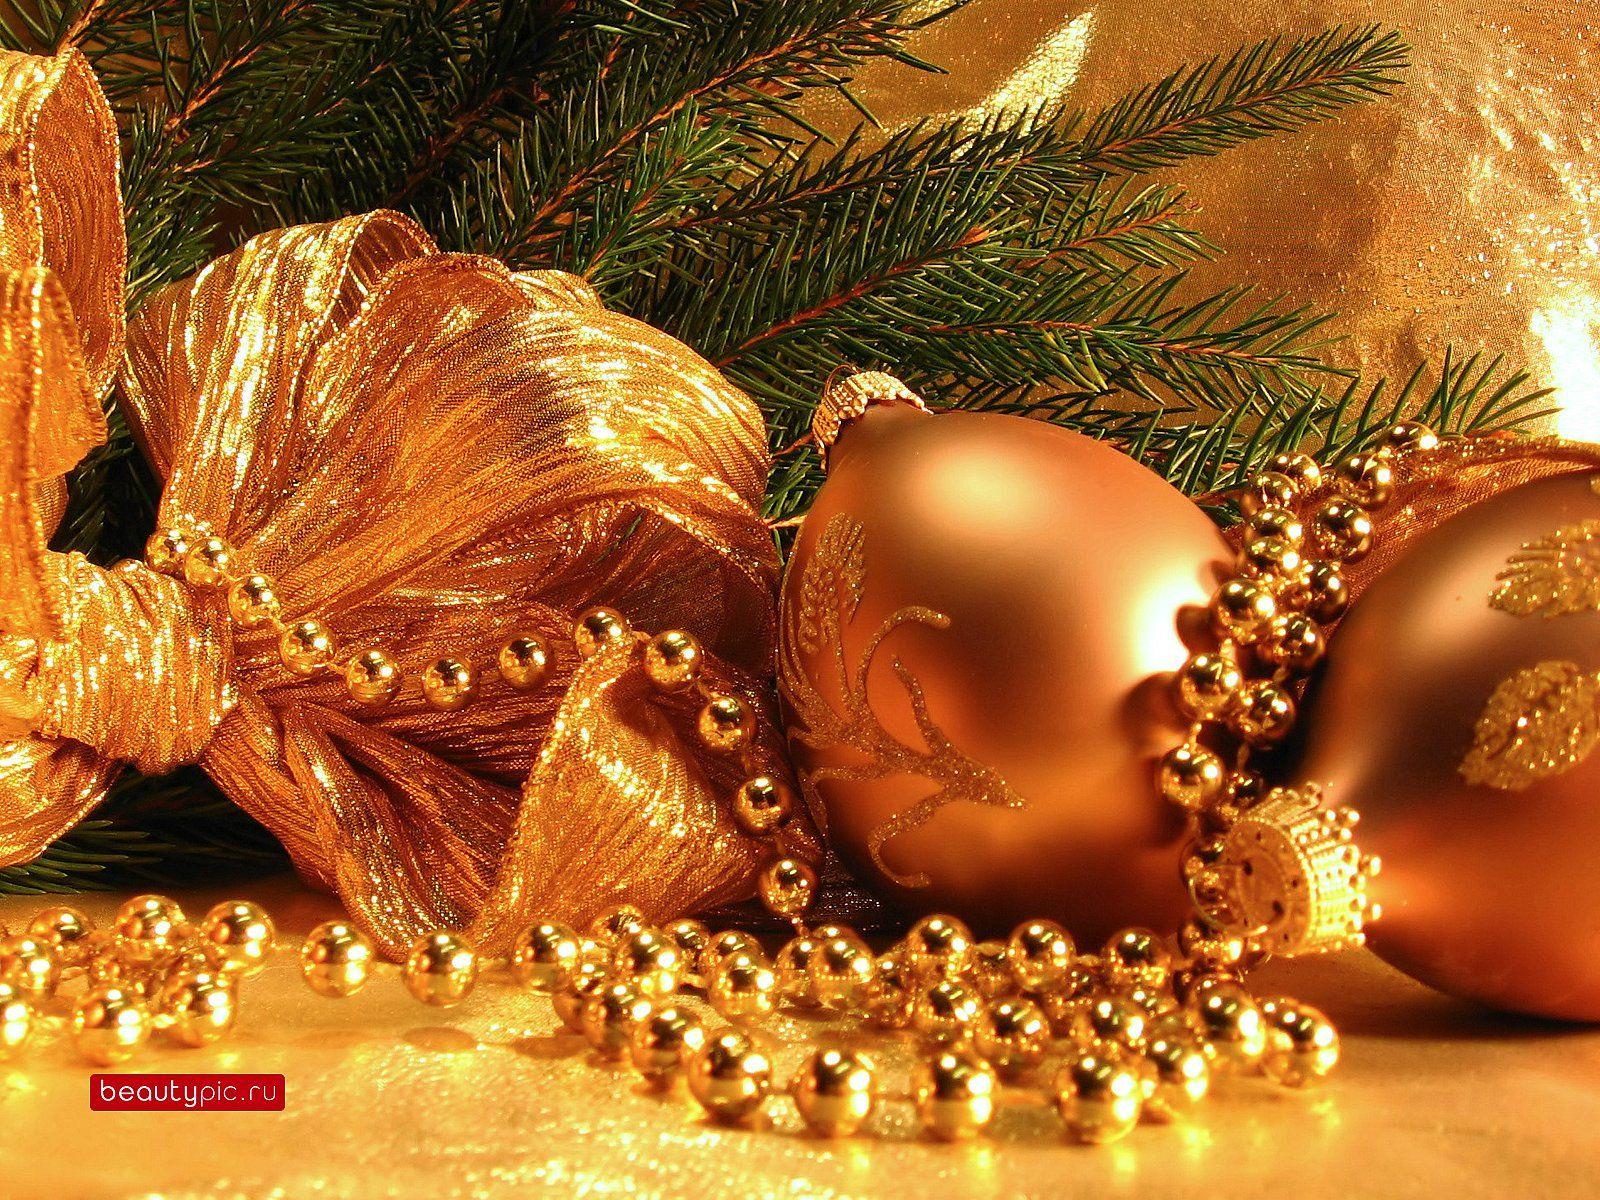 golden christmas ornaments